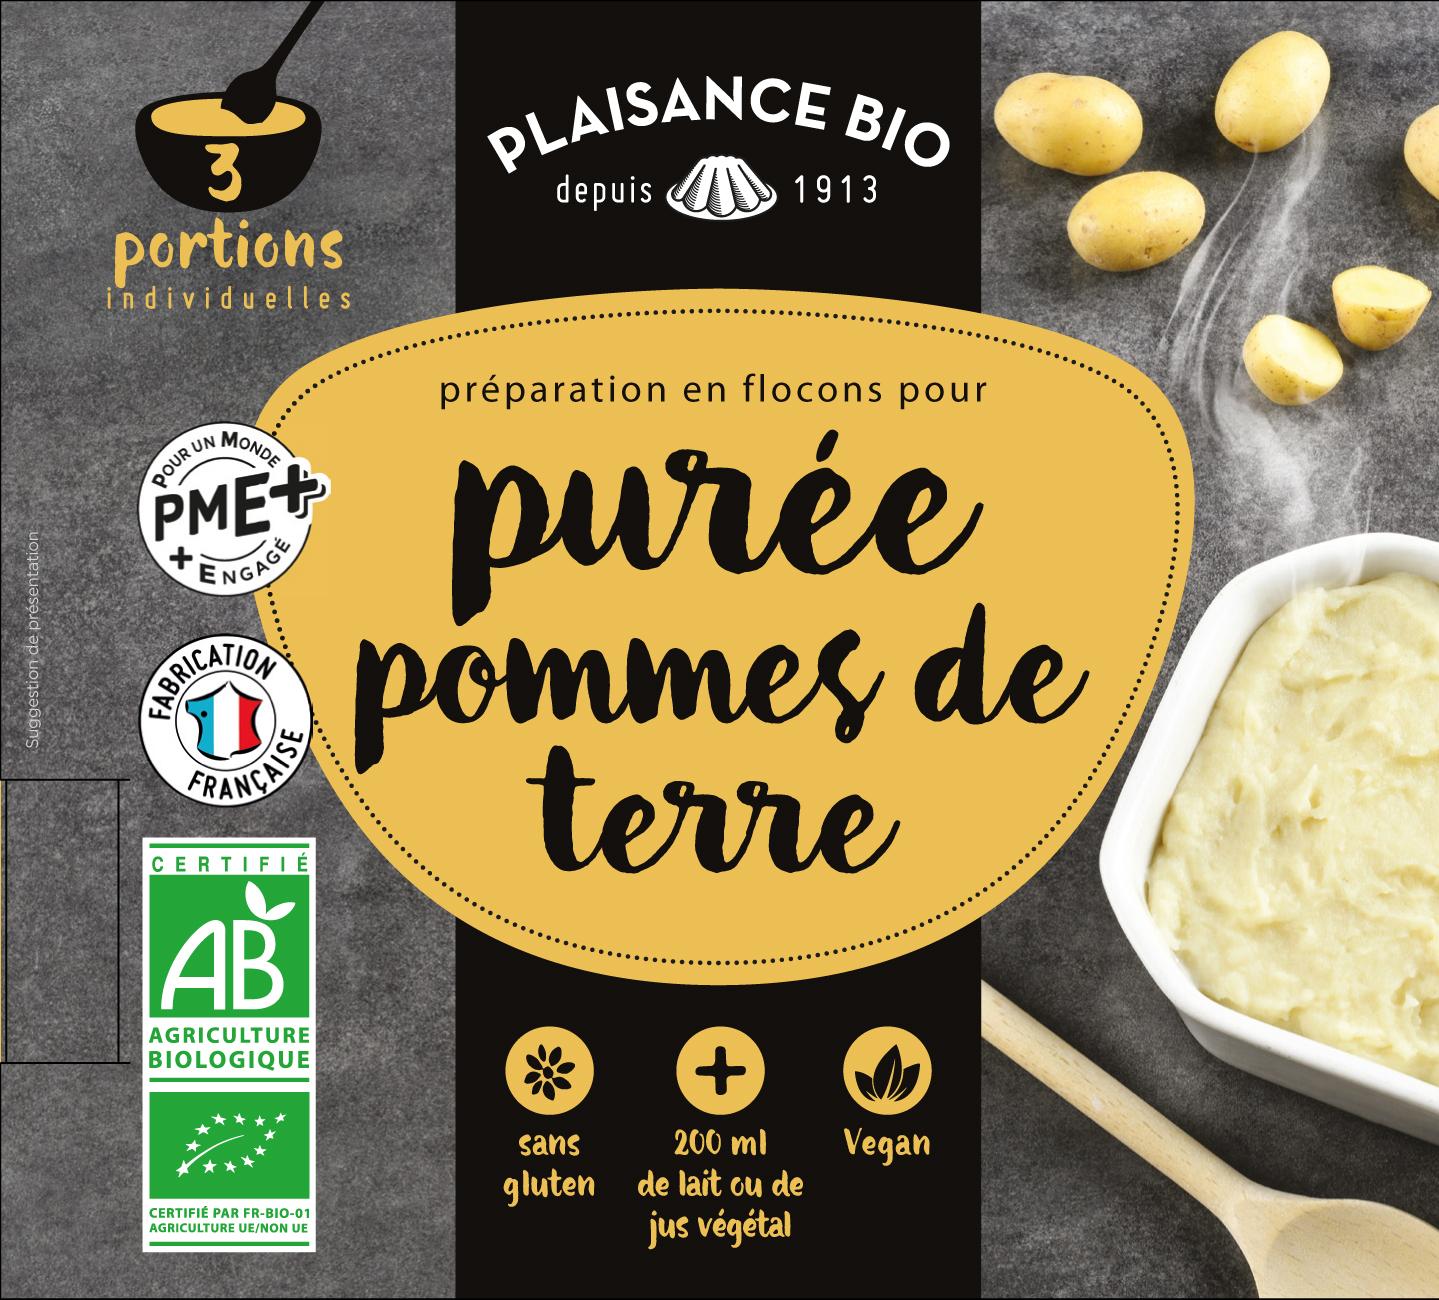 PUREE PDT PLAISANCE BIO 2019